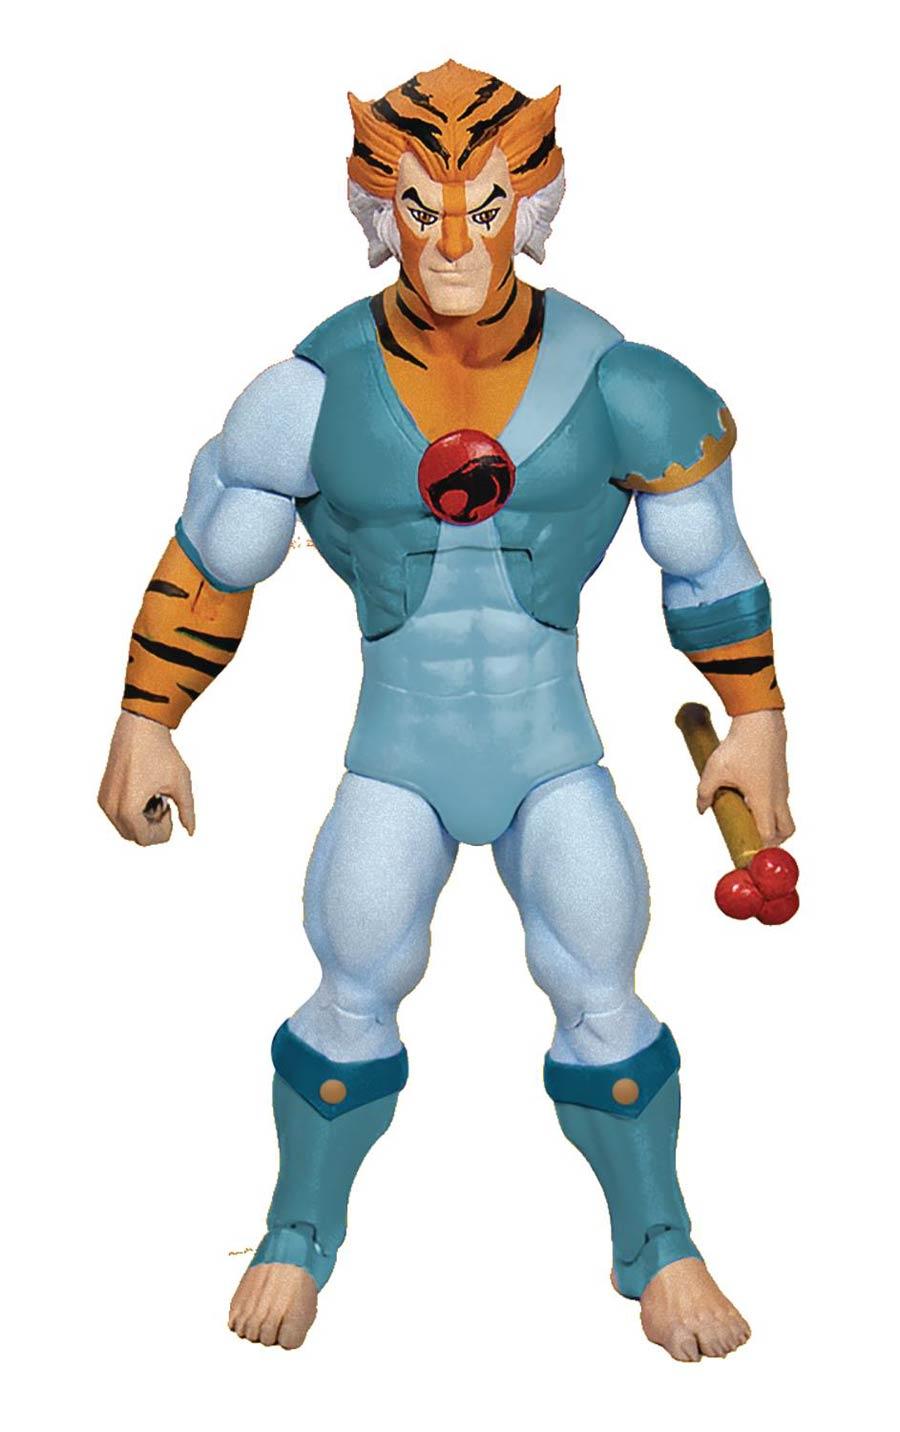 Thundercats Ultimates Wave 2 Tygra The Scientist Warrior Action Figure